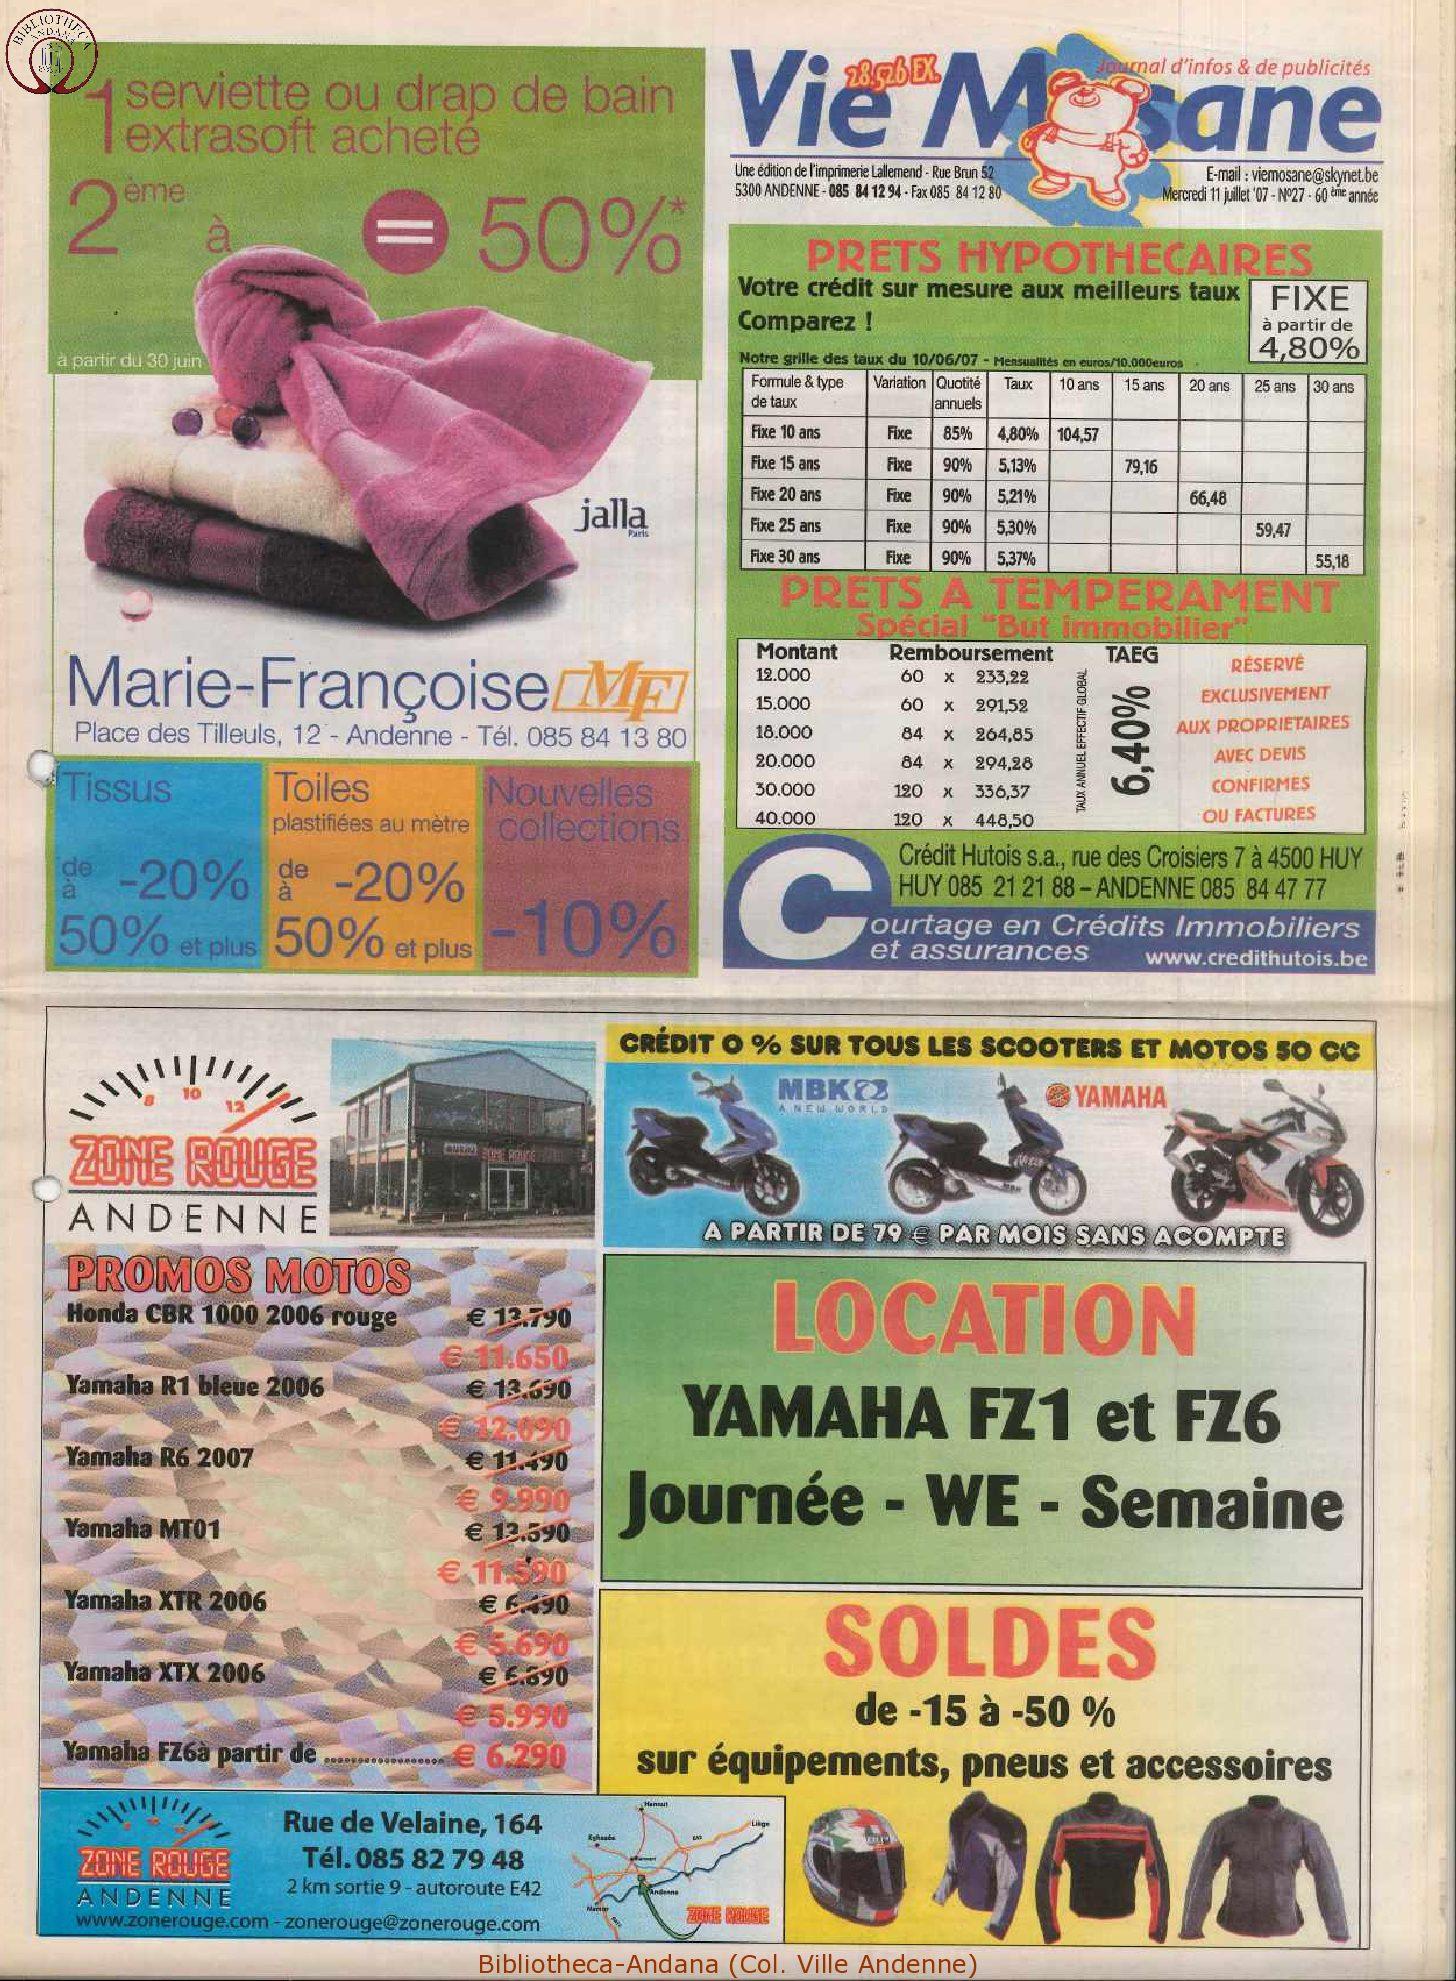 60e année - n°27 - 11 juillet 2007